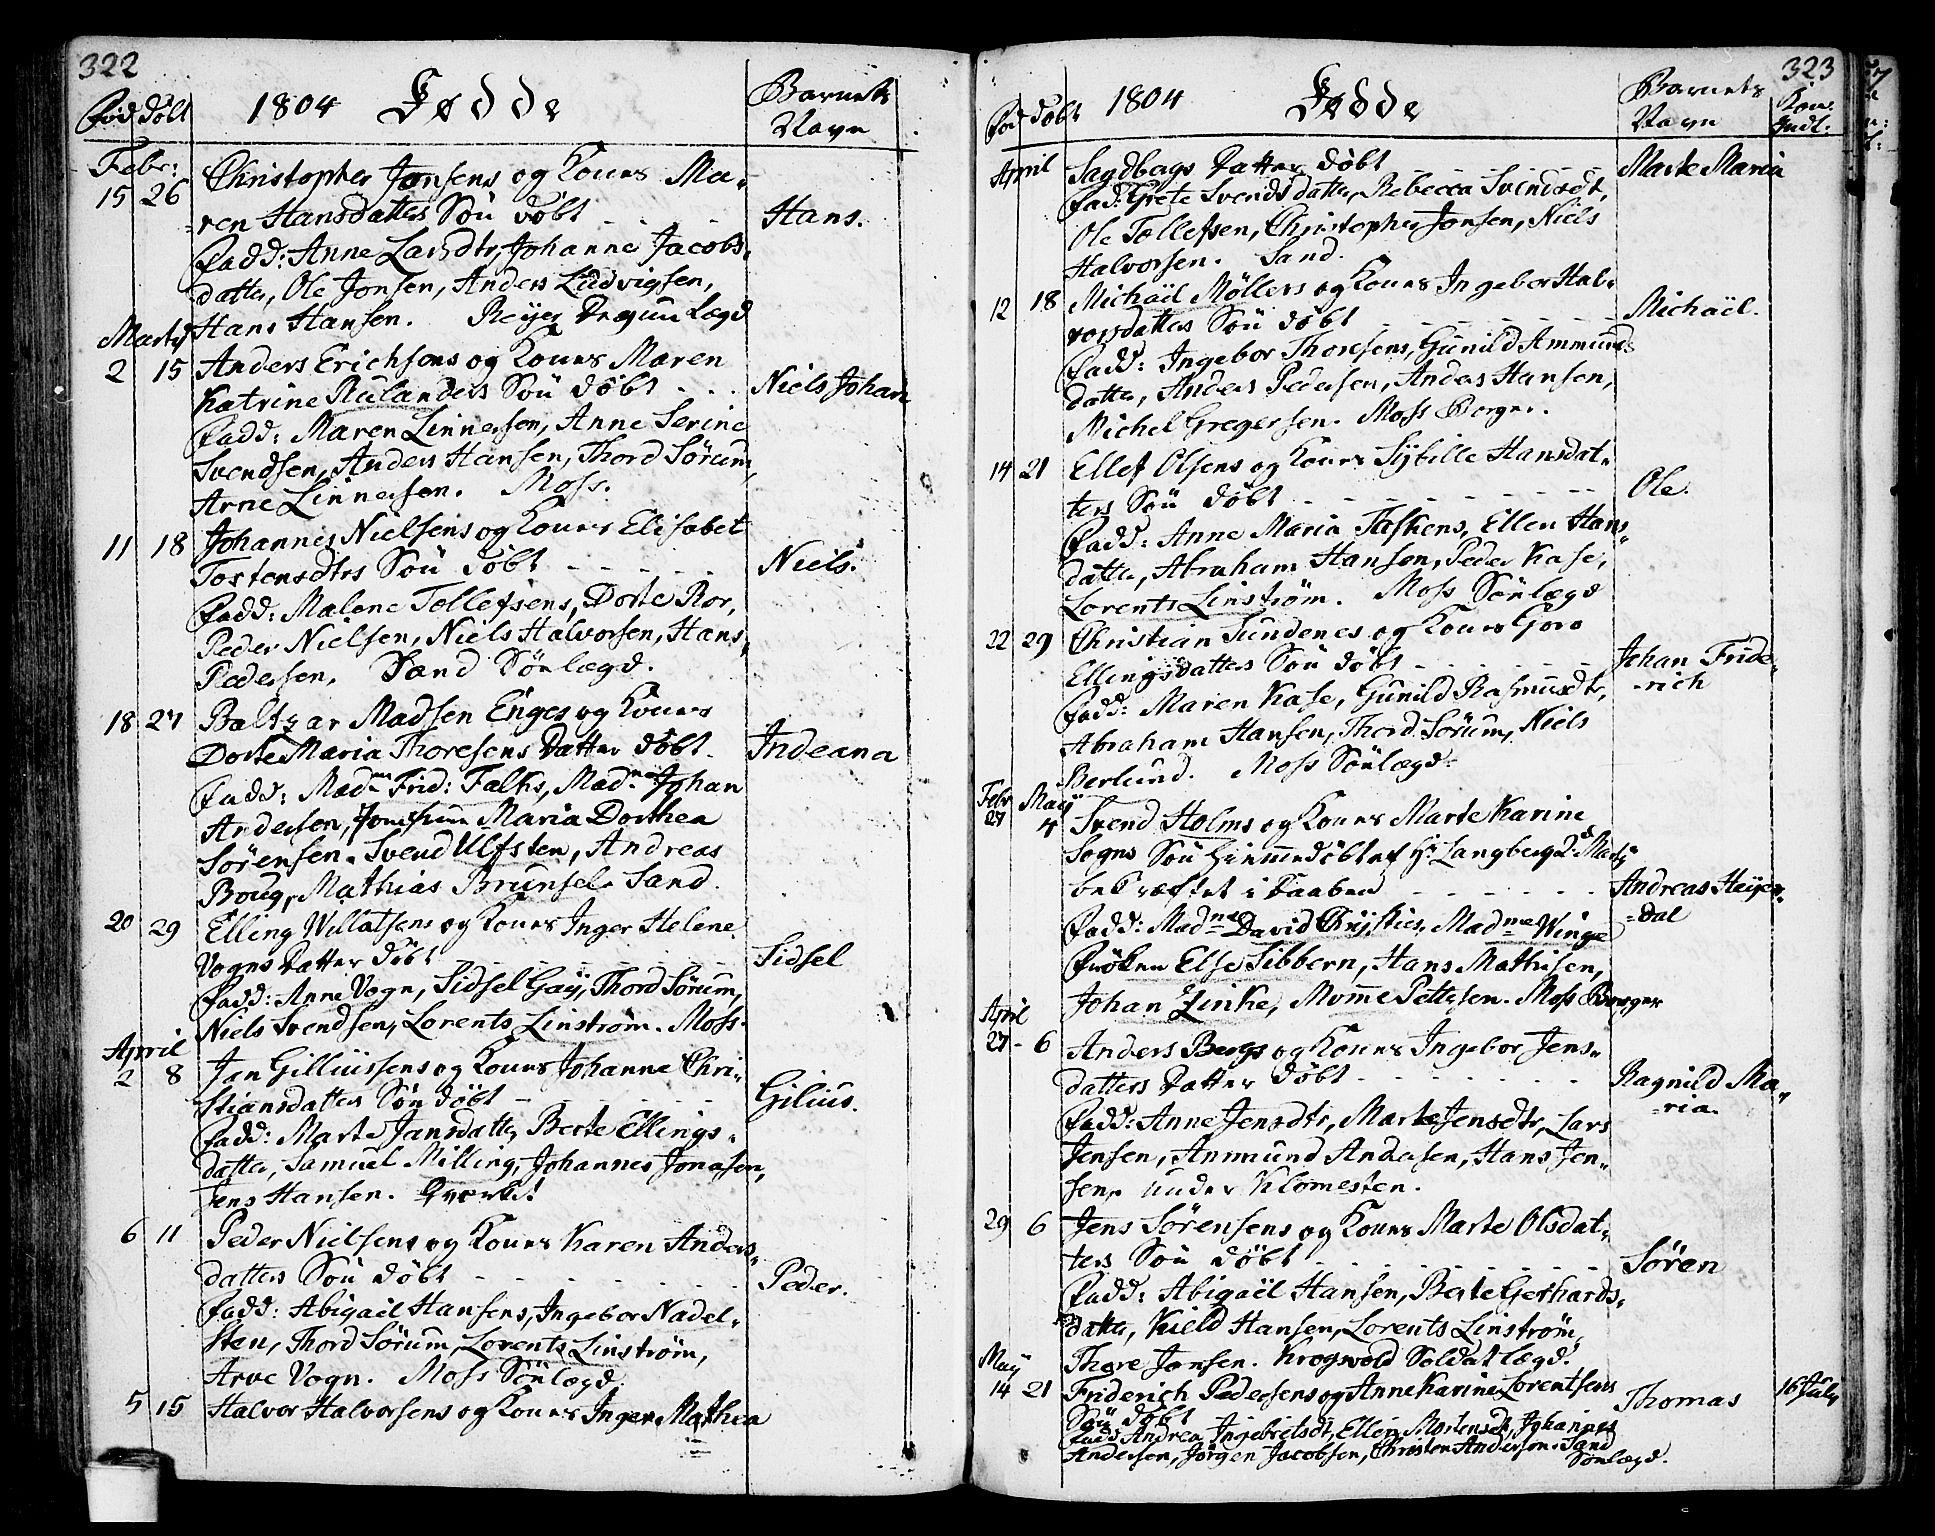 SAO, Moss prestekontor Kirkebøker, F/Fa/Faa/L0004: Ministerialbok nr. I 4, 1784-1808, s. 322-323